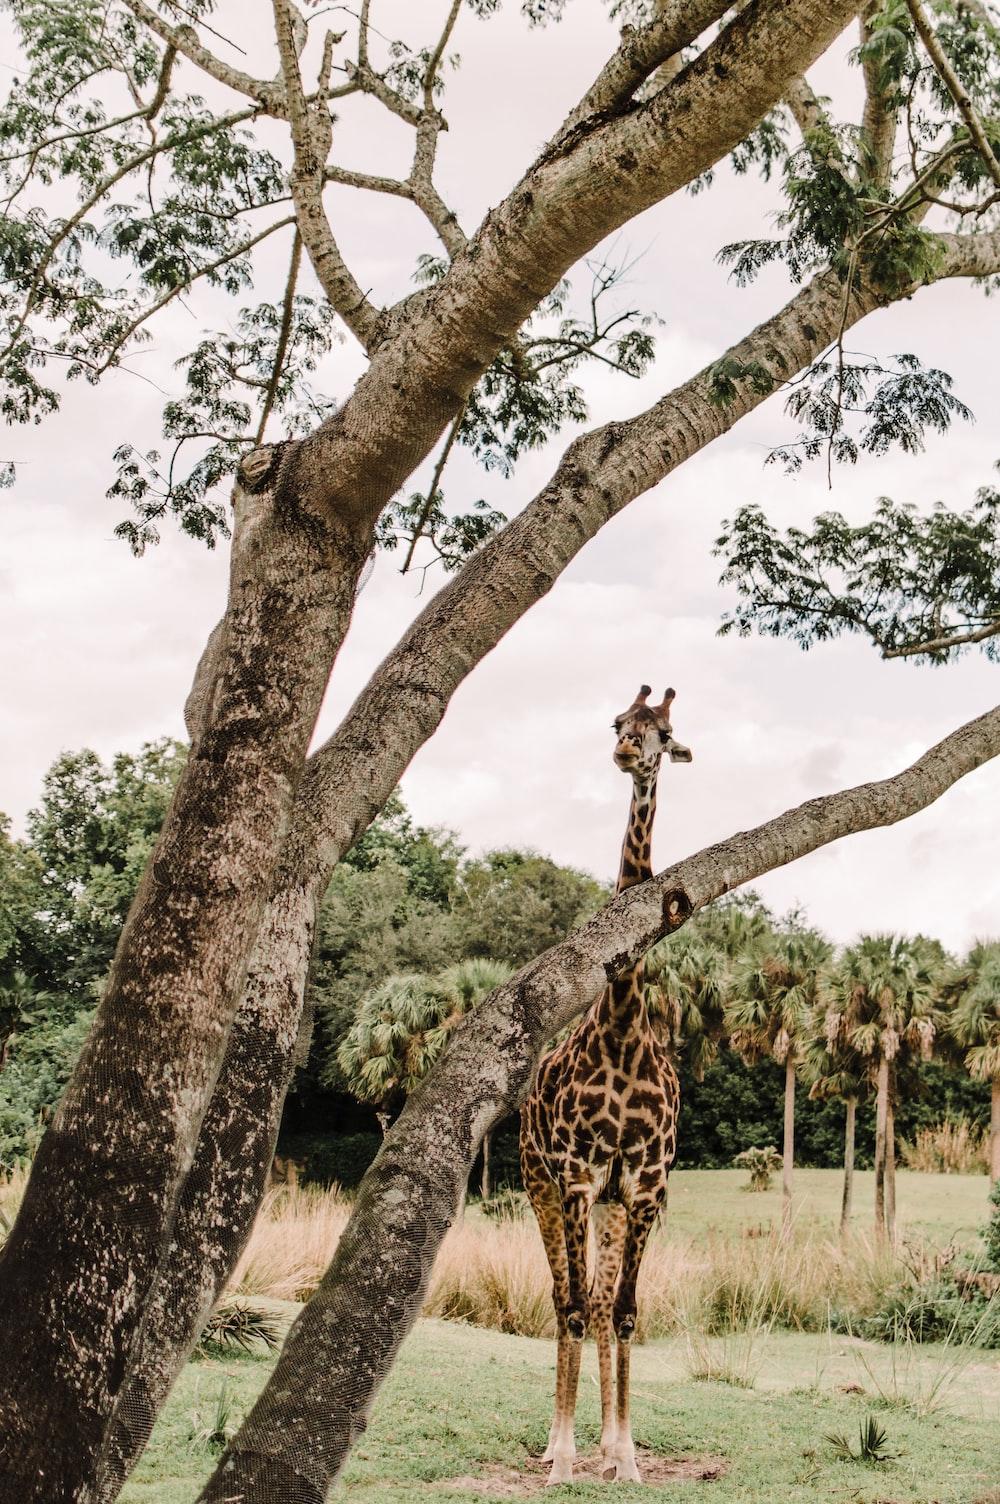 giraffe standing beside tree